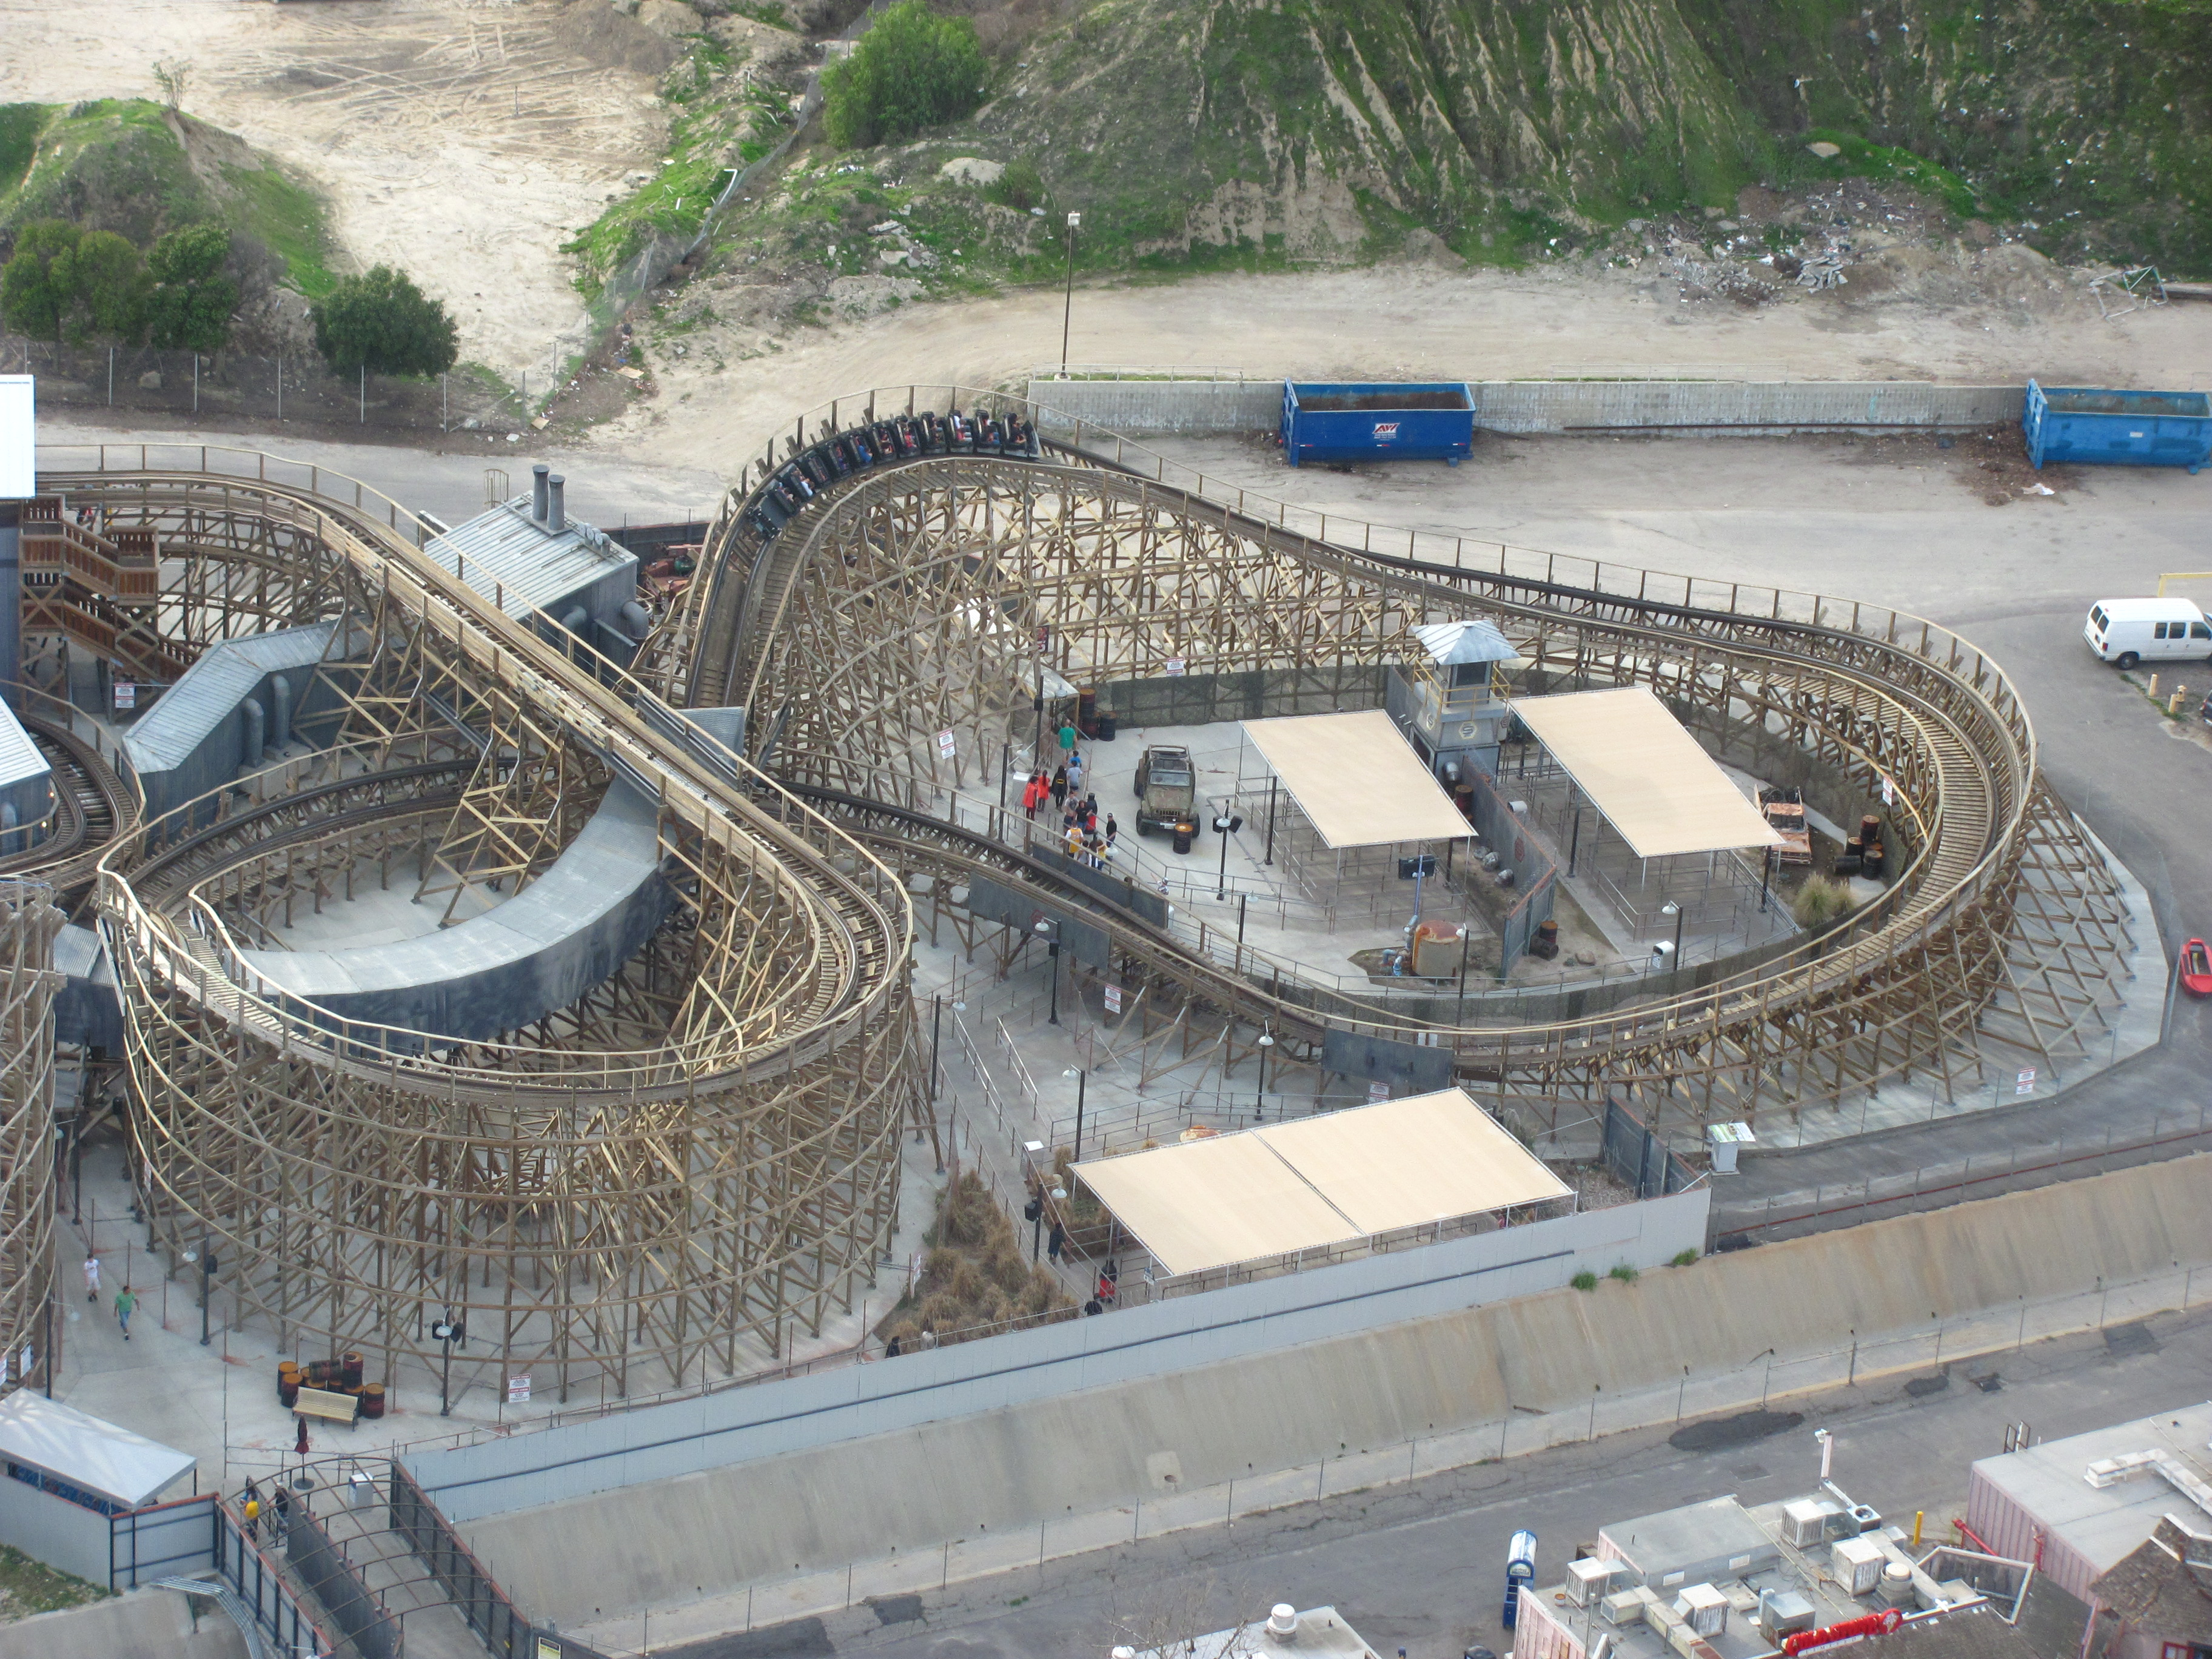 Apocalypse (Six Flags Magic Mountain)